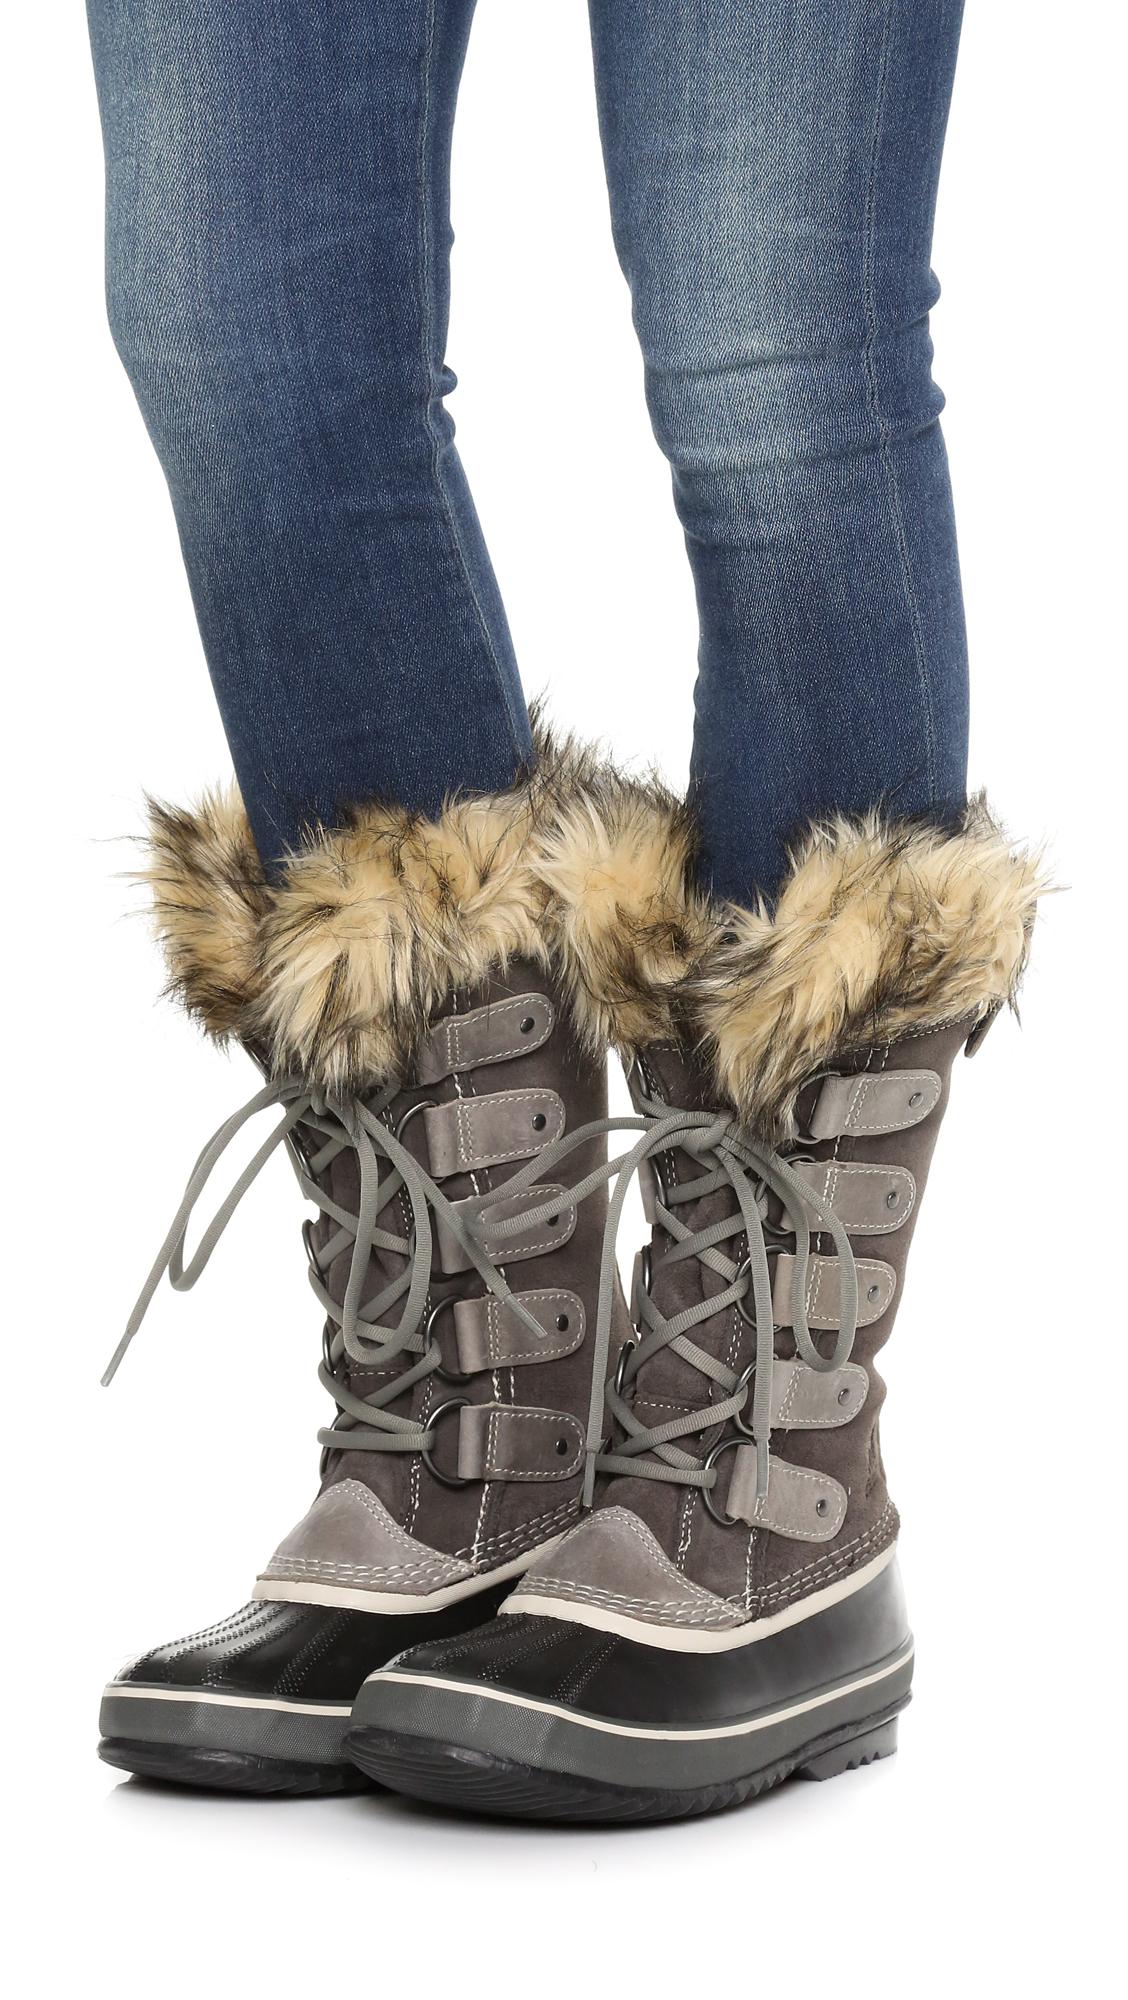 sorel joan of arctic boots in gray lyst. Black Bedroom Furniture Sets. Home Design Ideas